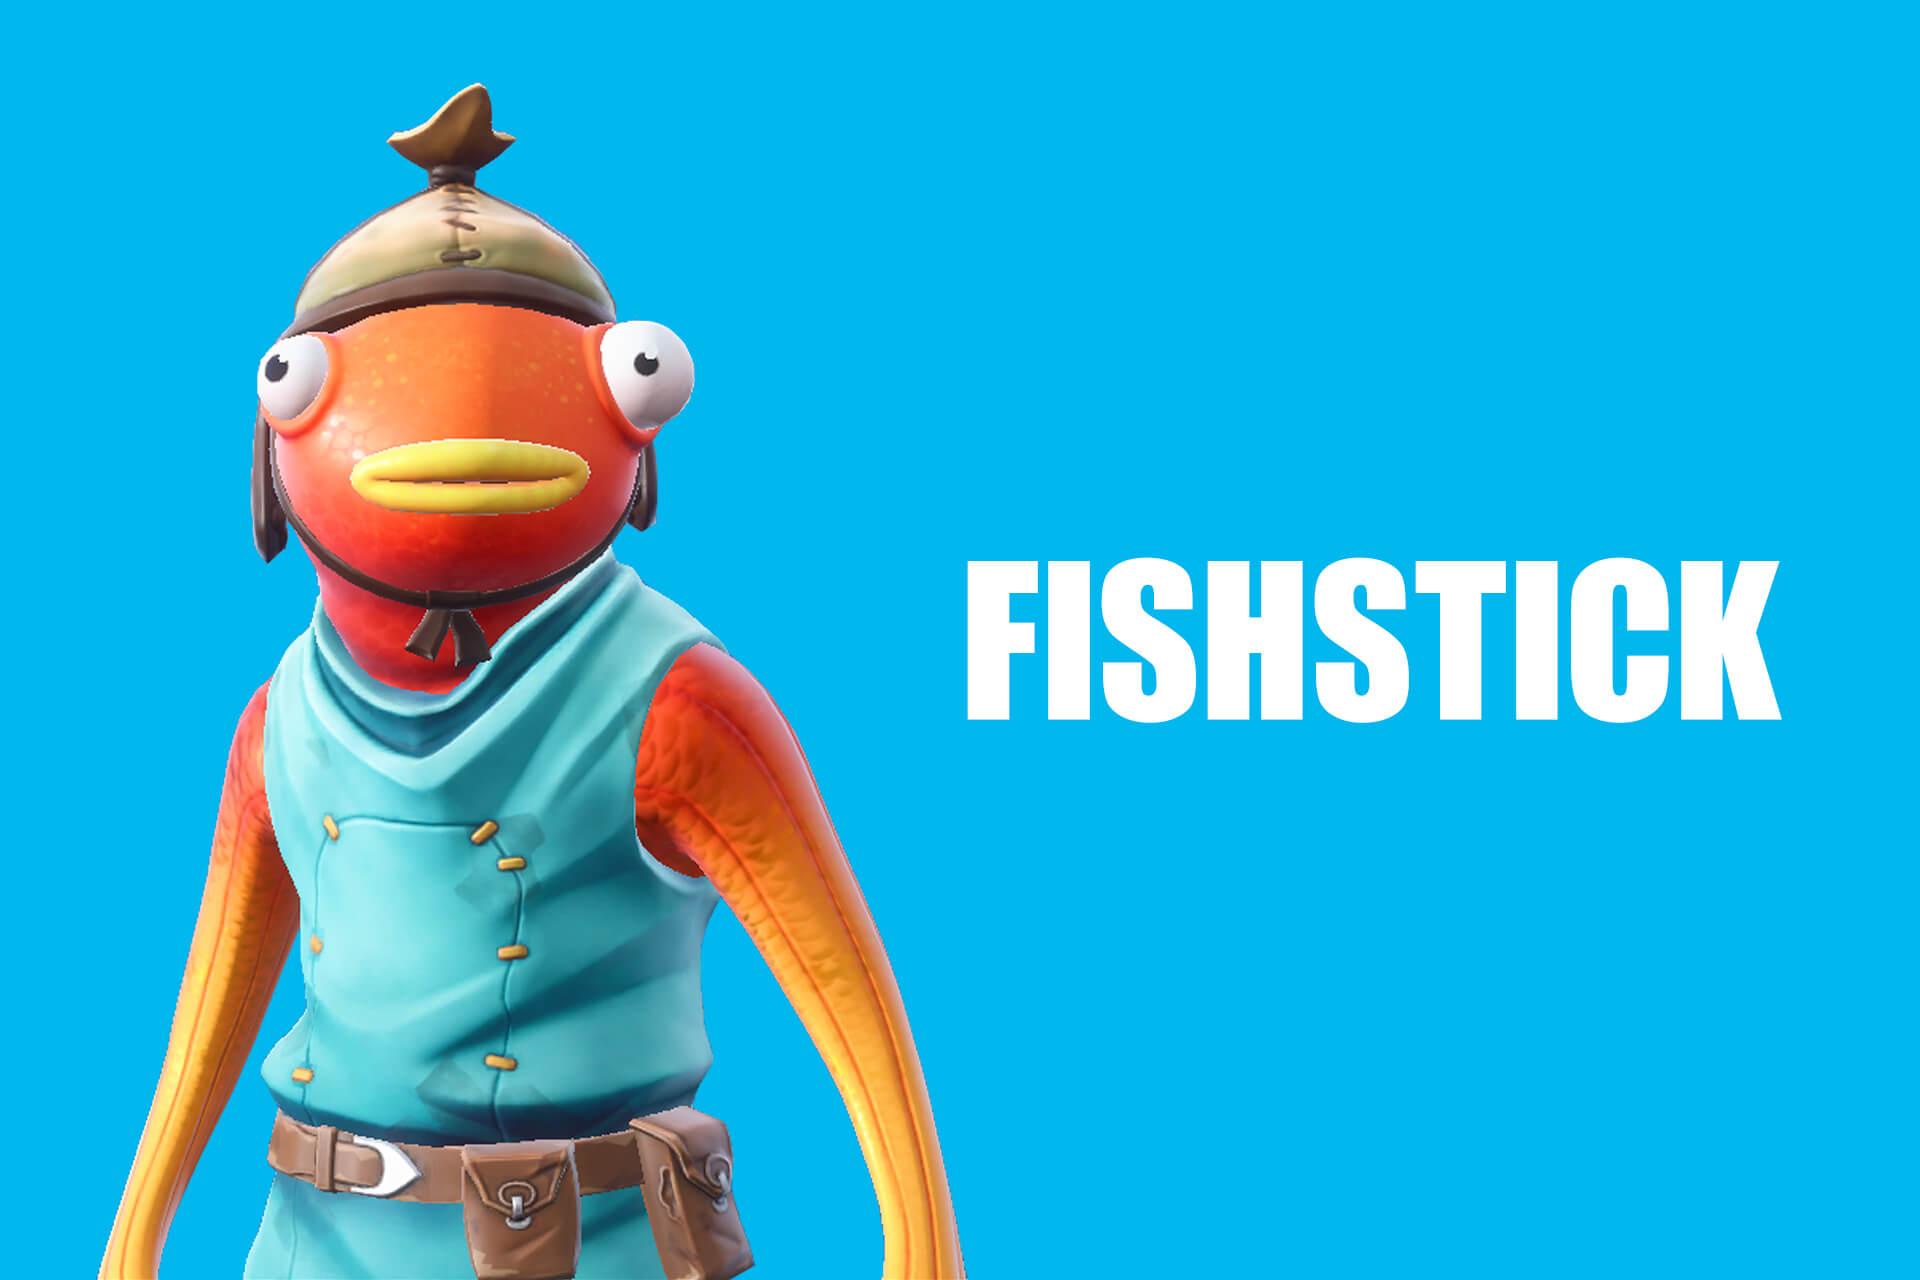 costume-fishstick1